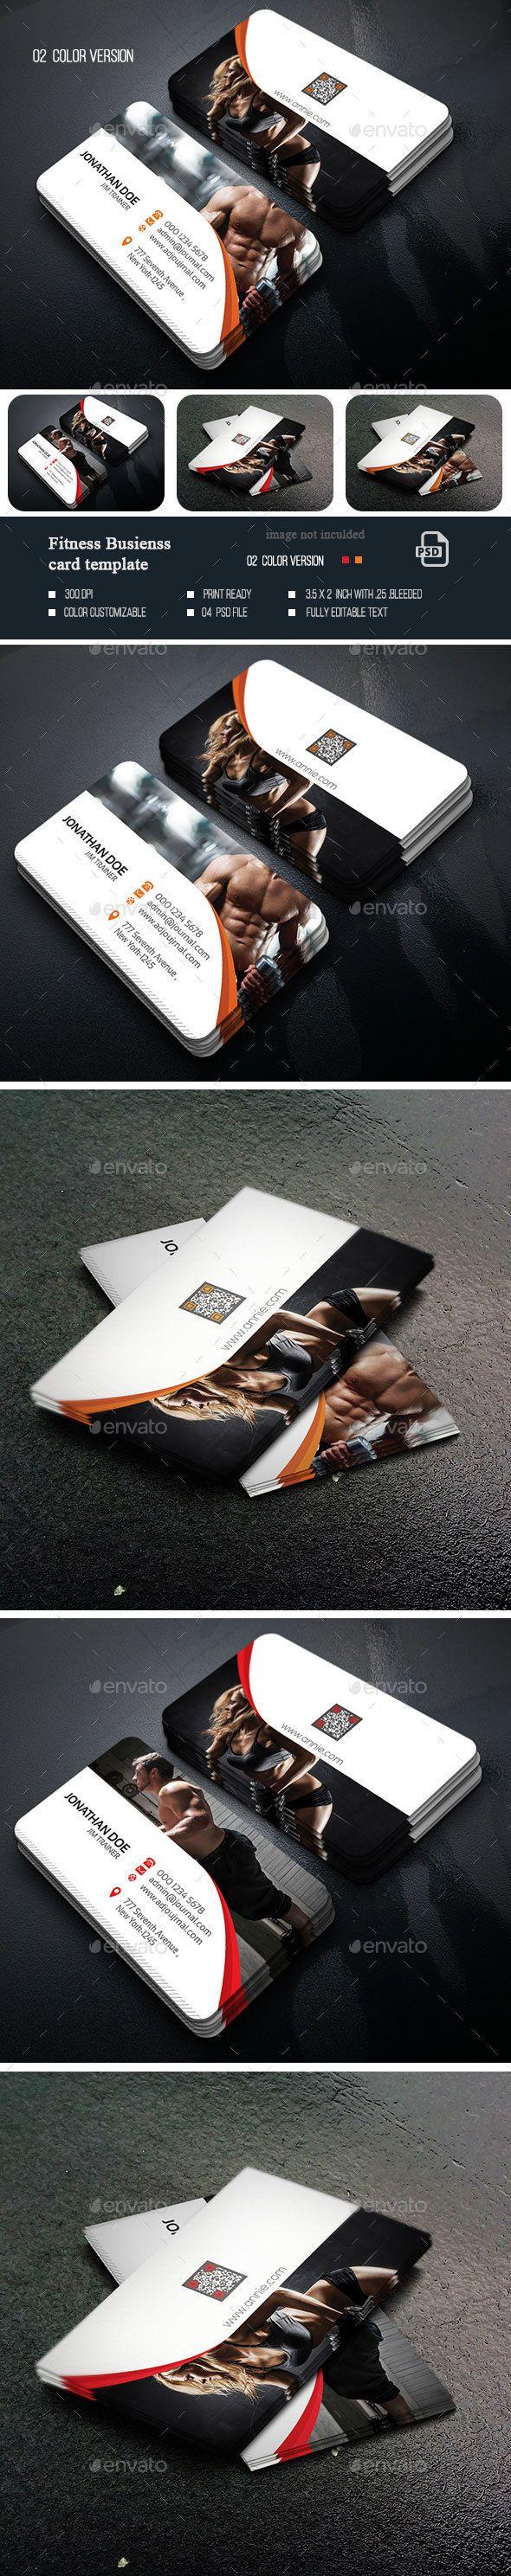 Fitness Business Card | Plantillas para tarjetas de presentacion ...